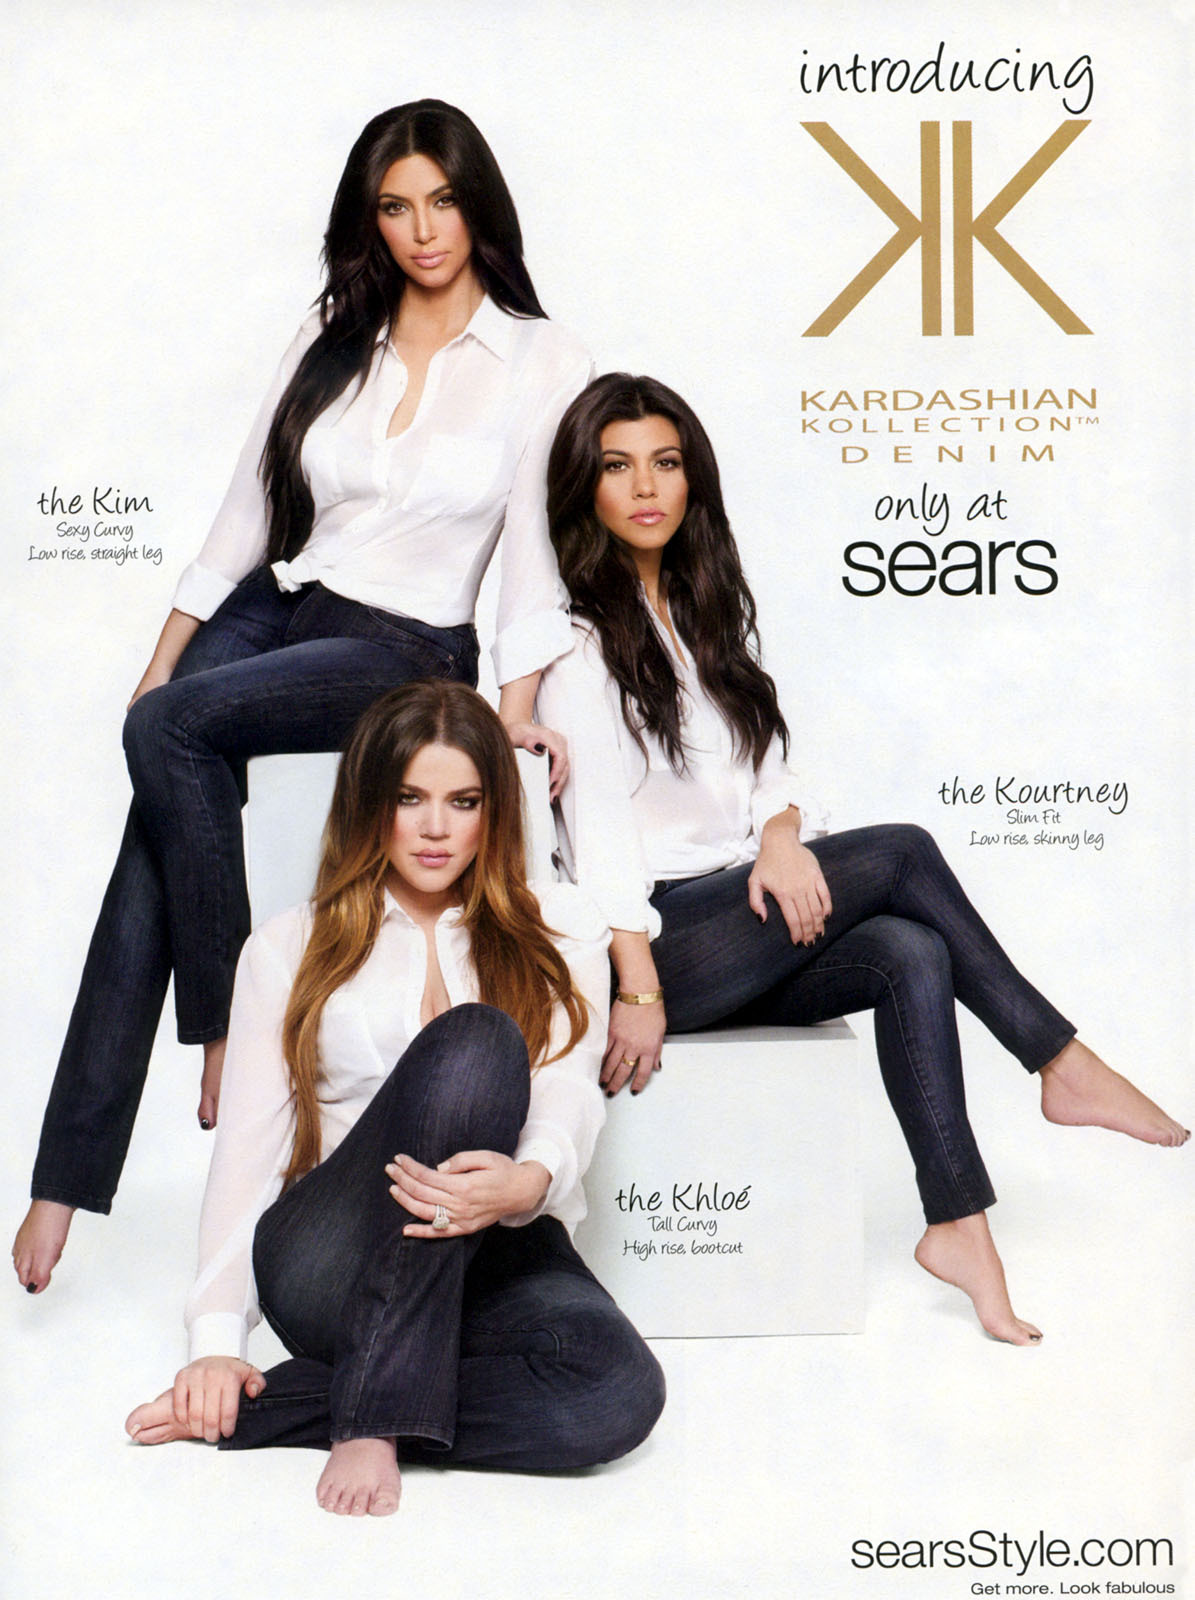 GirlsWithBareFeet - Three Kardashians in an ad.